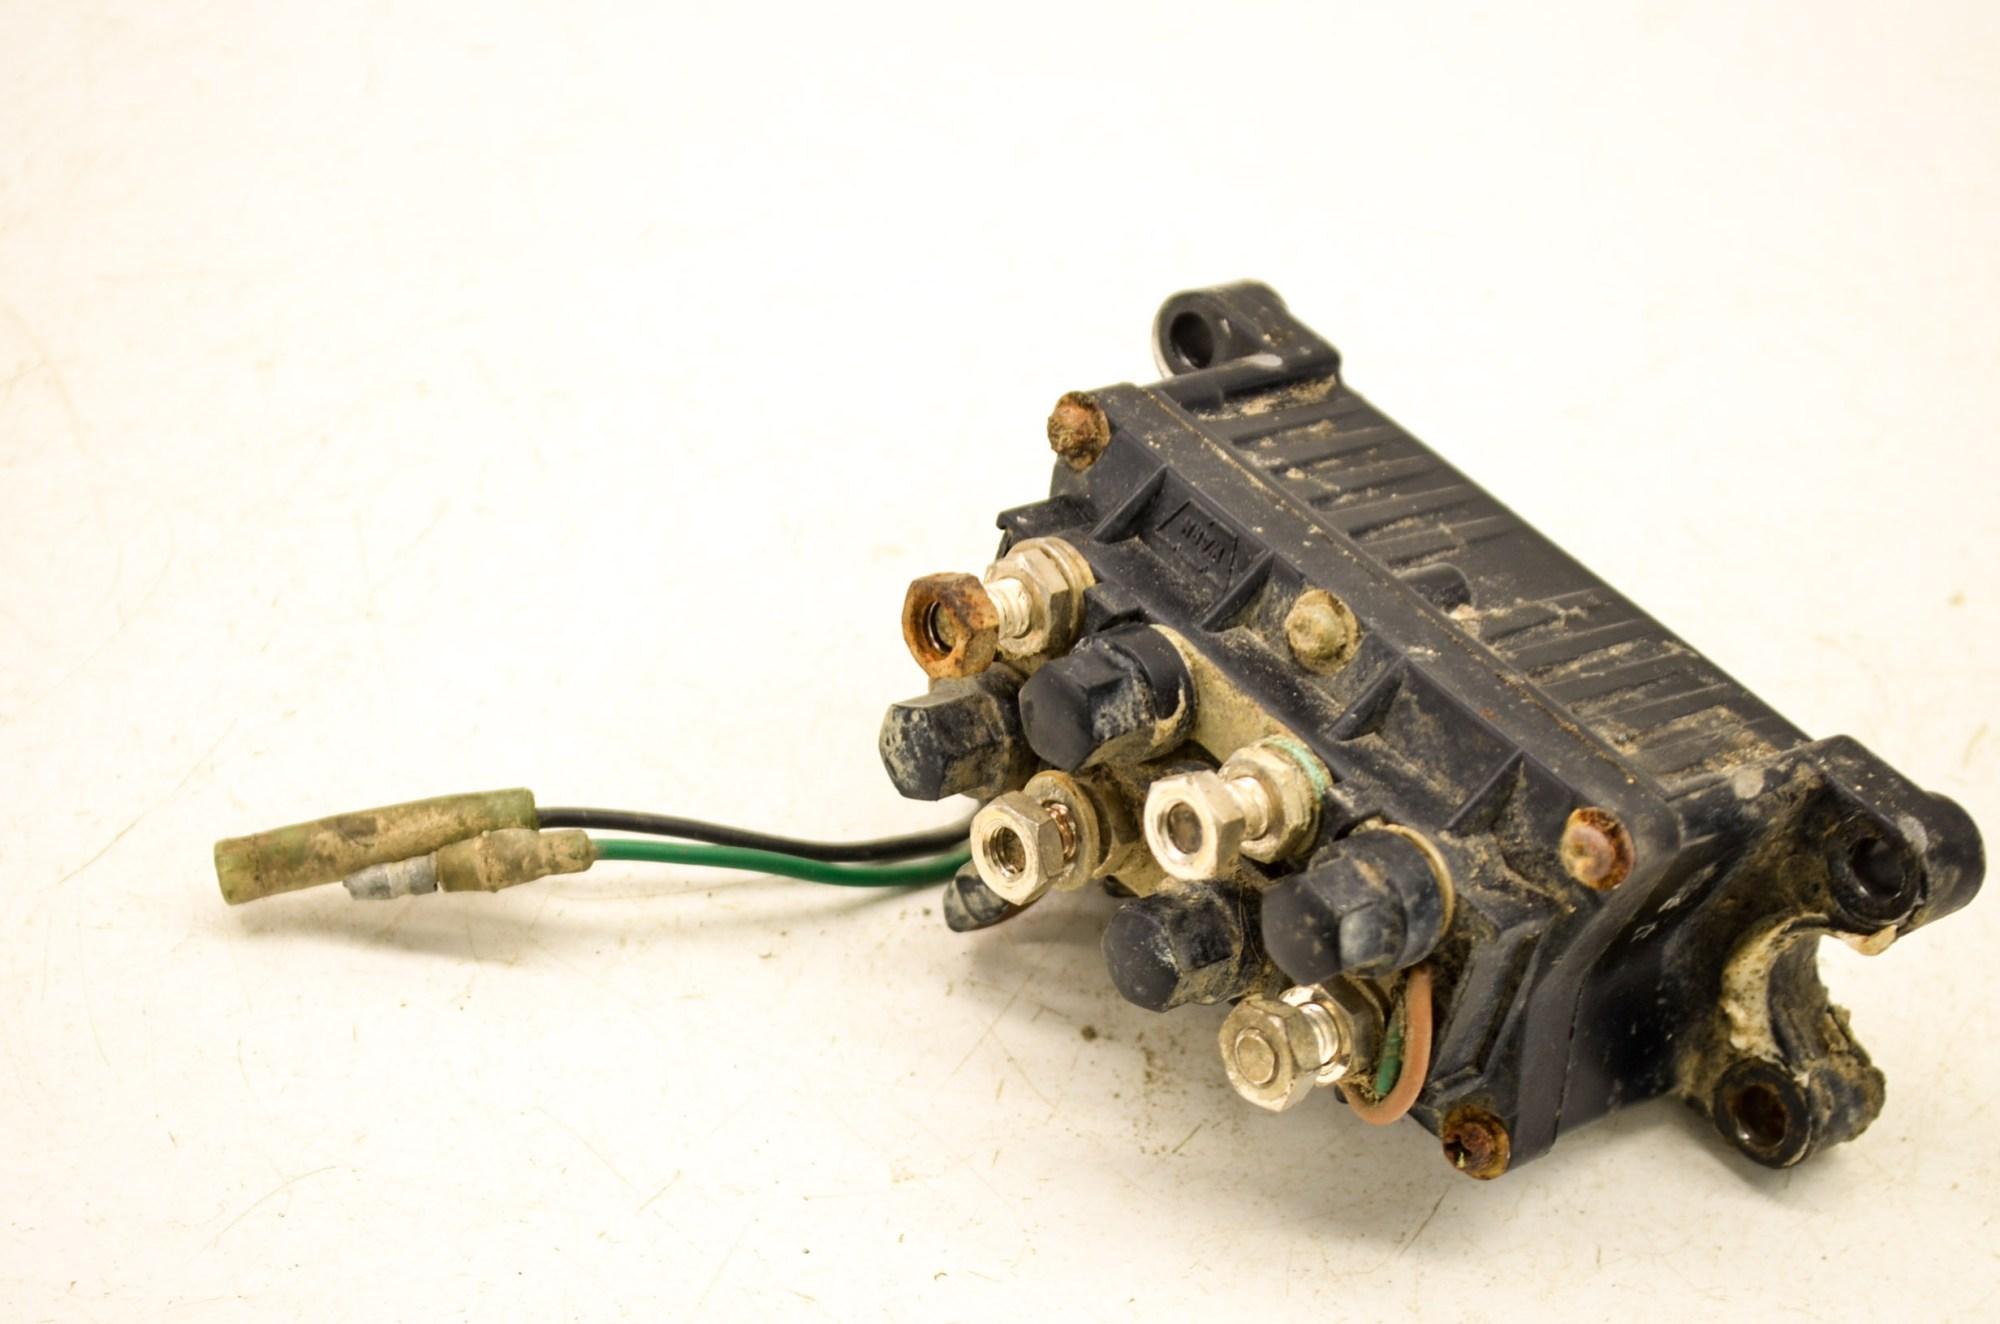 hight resolution of 04 honda rincon 650 warn winch fuse box trx650fa 4x4